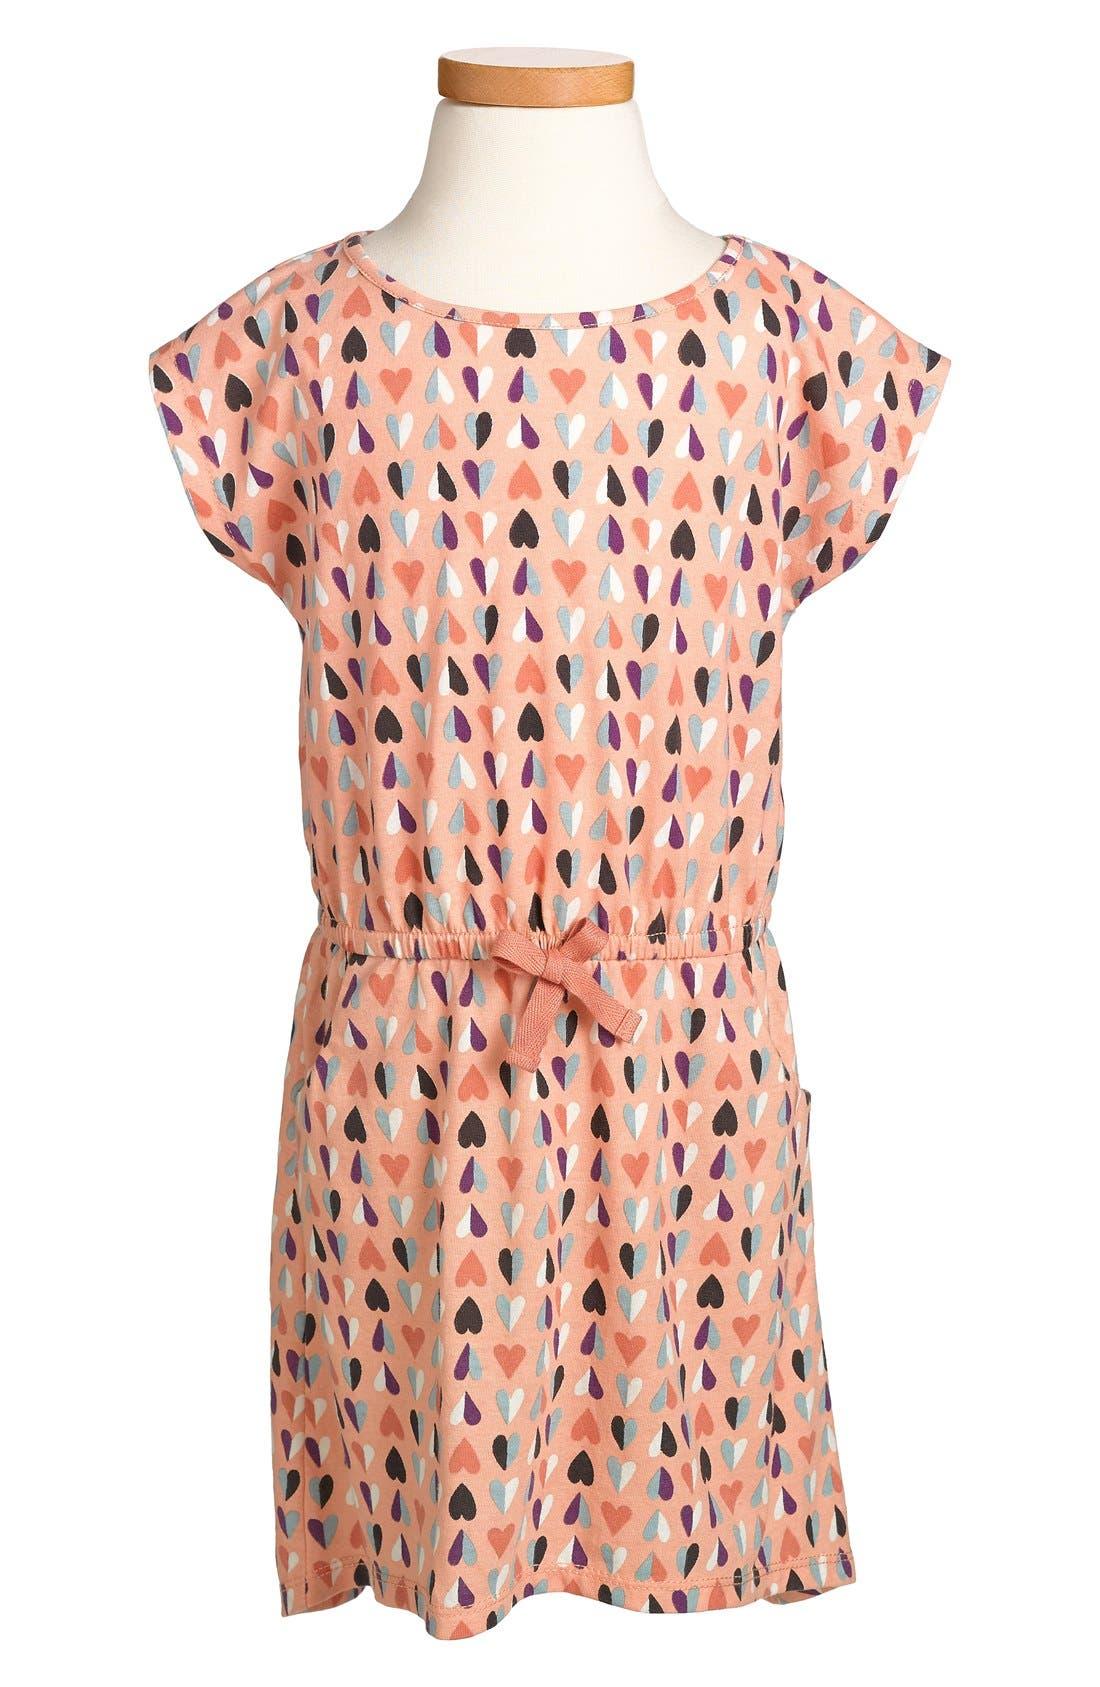 Alternate Image 1 Selected - Tucker + Tate 'Reiko' Print Dress (Toddler Girls)